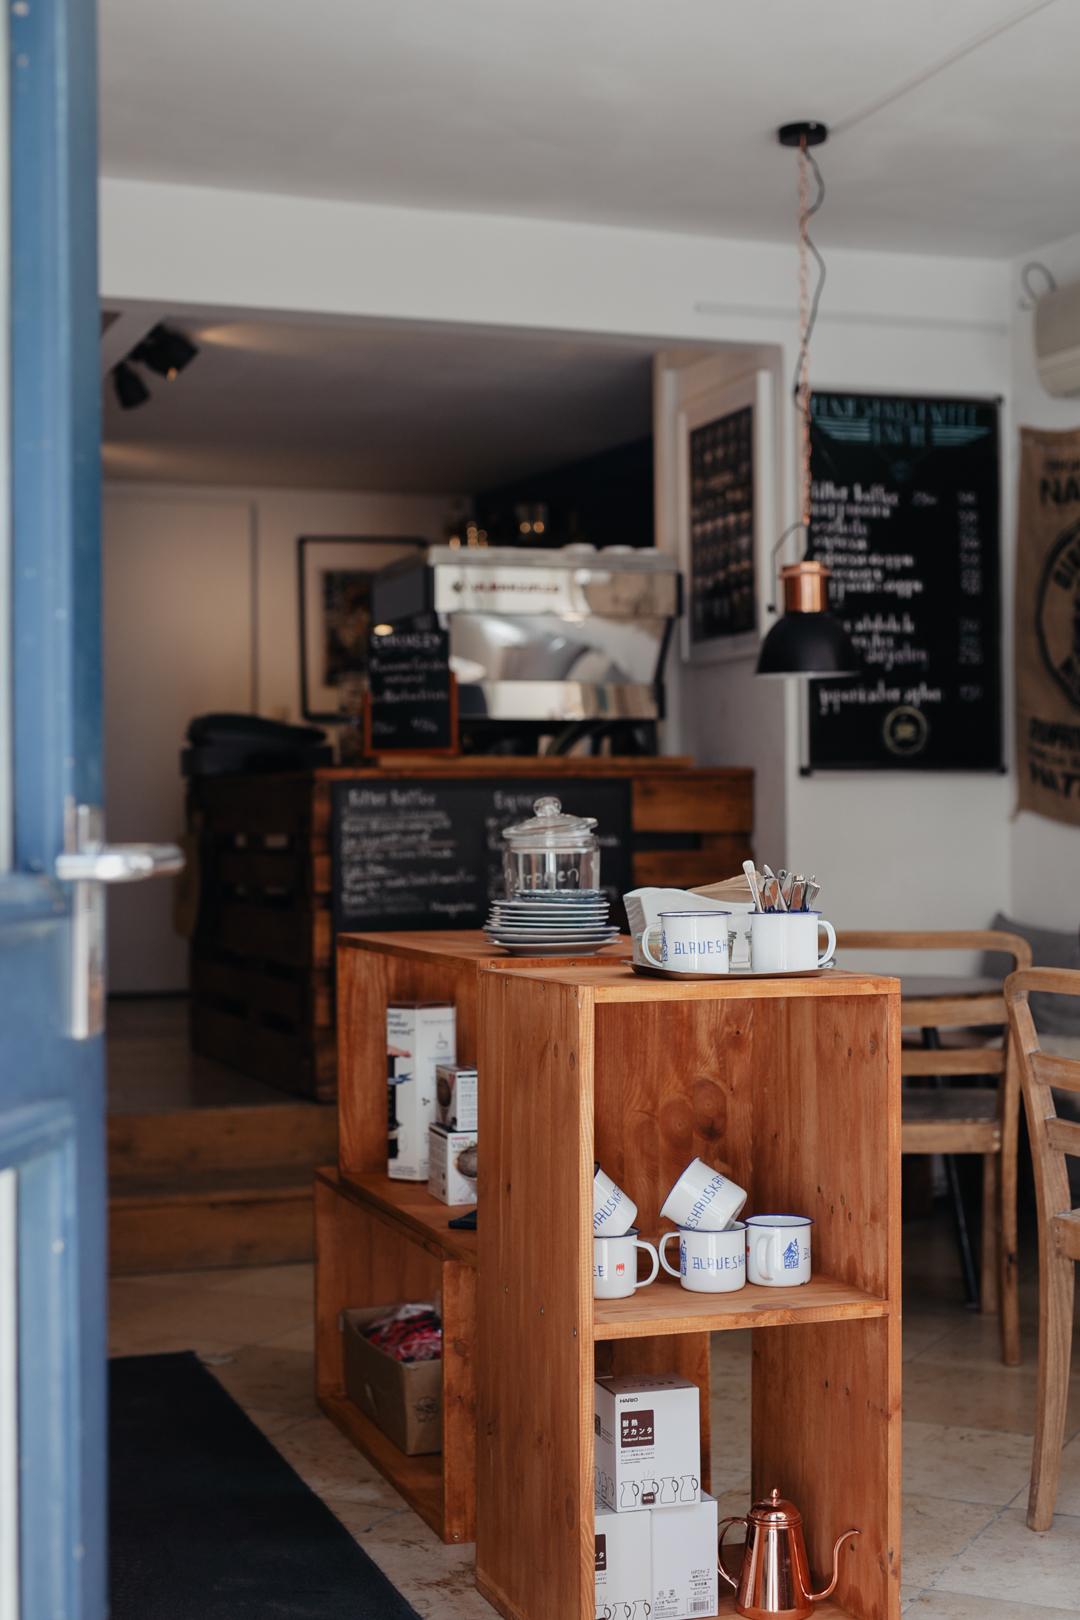 #supportyourlocal Schwabach – Blaues Haus Kaffee // Pieces of Mariposa